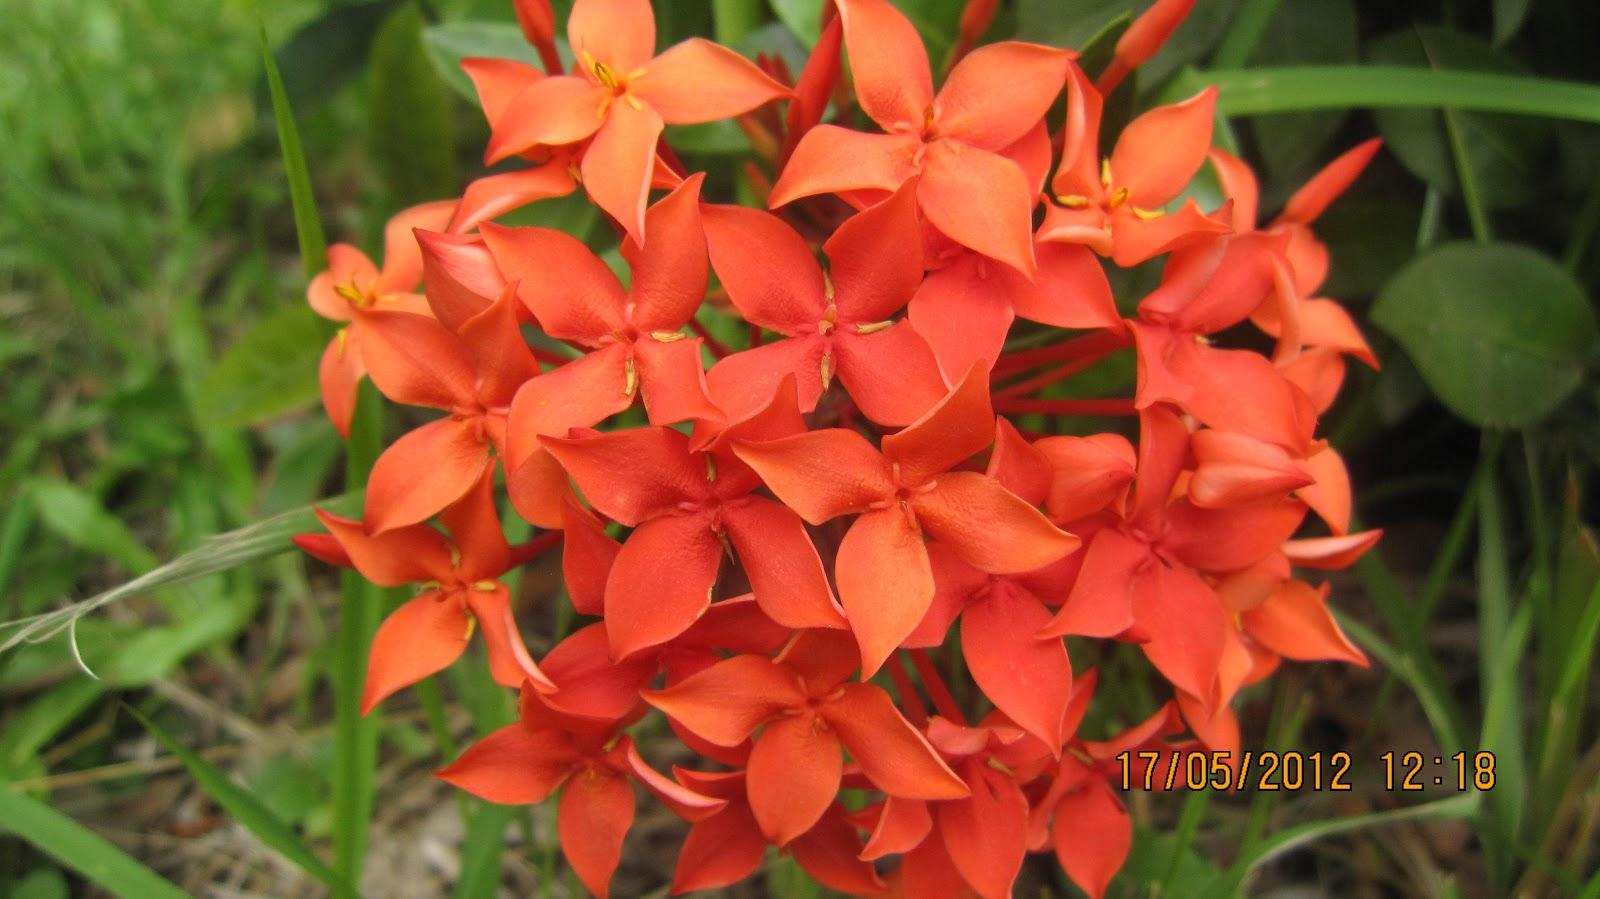 Different Flowers In Bangladesh Description